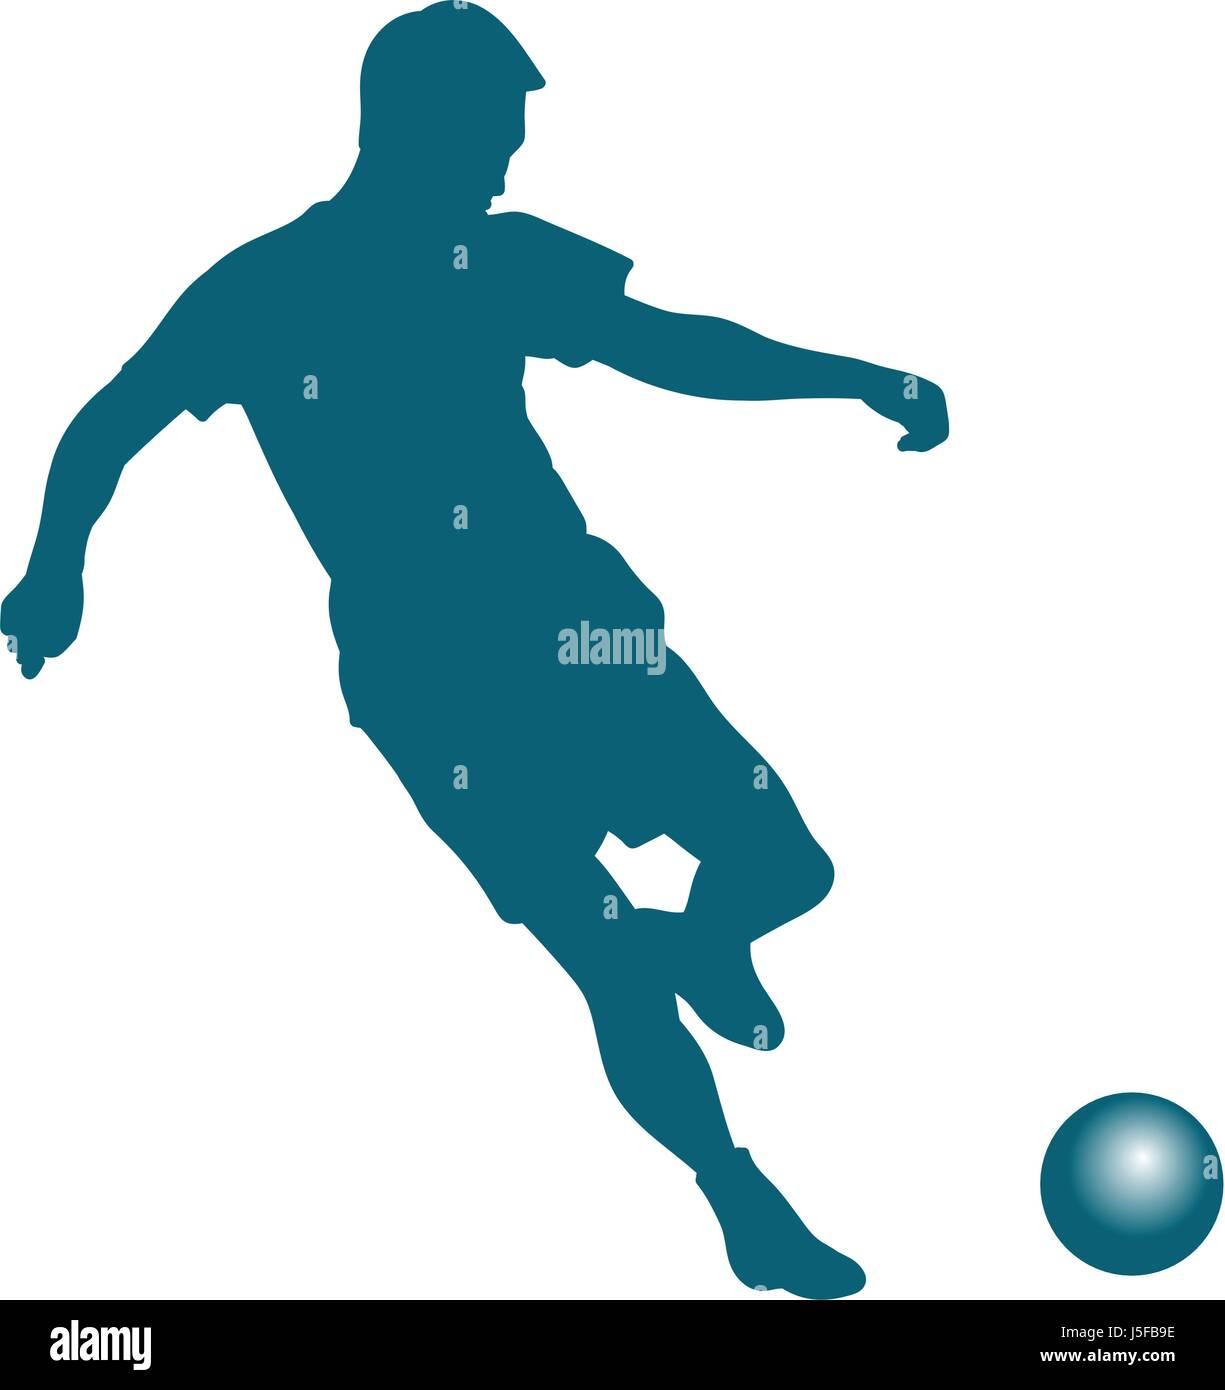 Silhouette of soccer player striking the ball - vector illustration Stock Vector